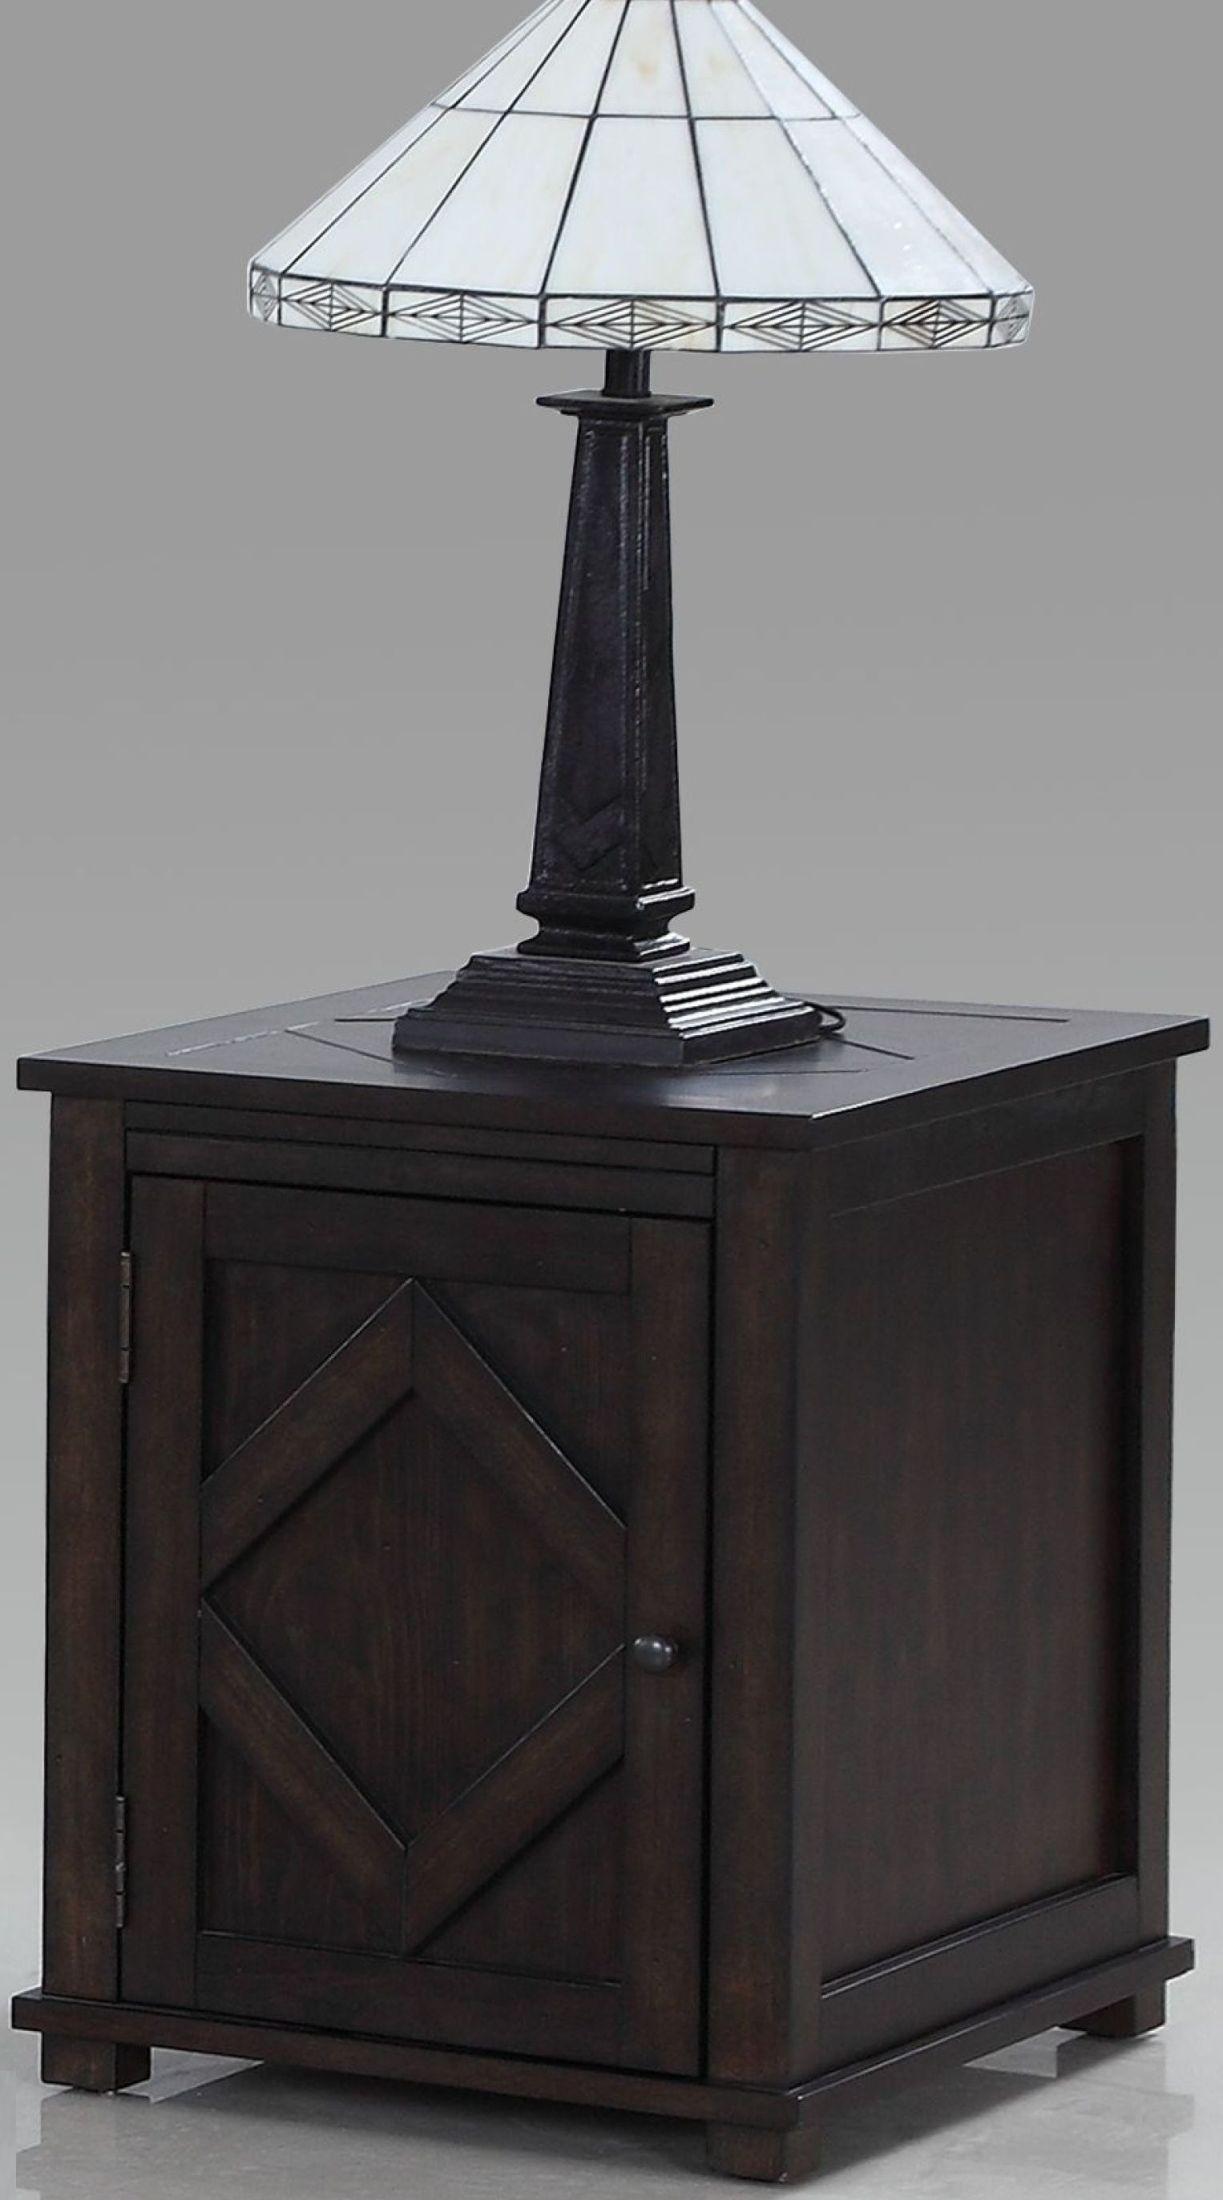 Genial Foxcroft Distressed Dark Pine Chairside Cabinet From Progressive Furniture  | Coleman Furniture